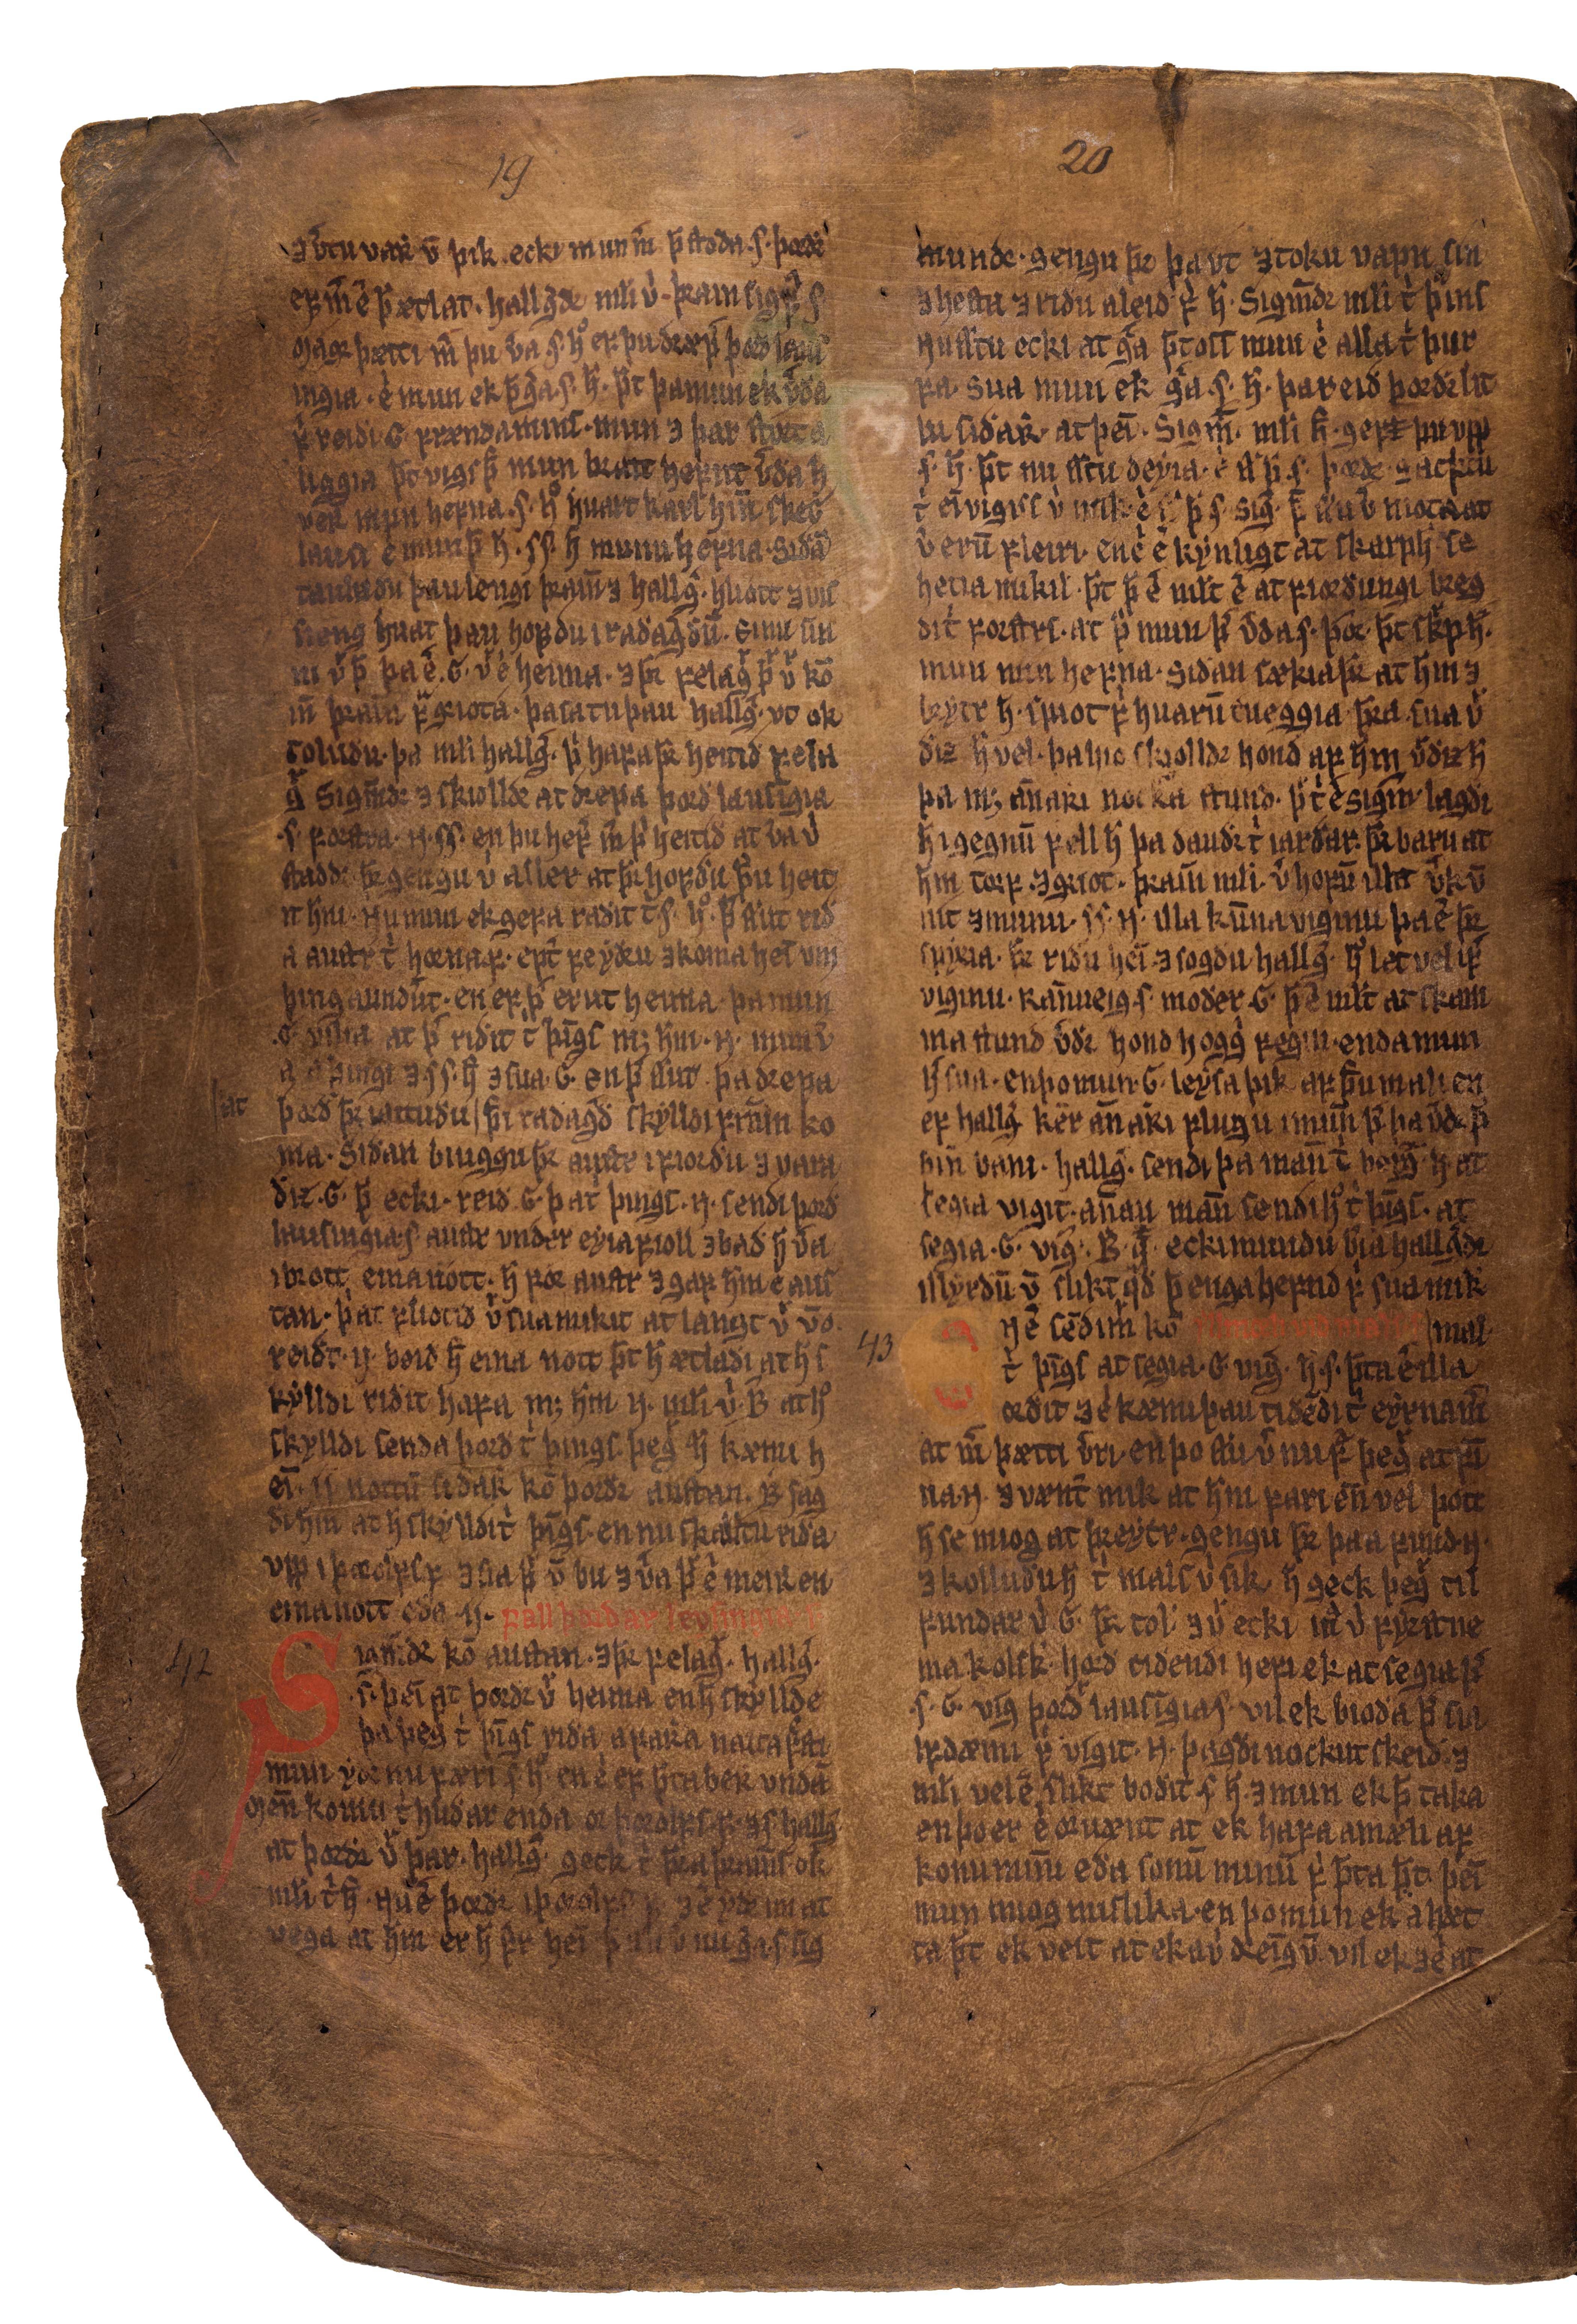 AM 132 fol - 15v